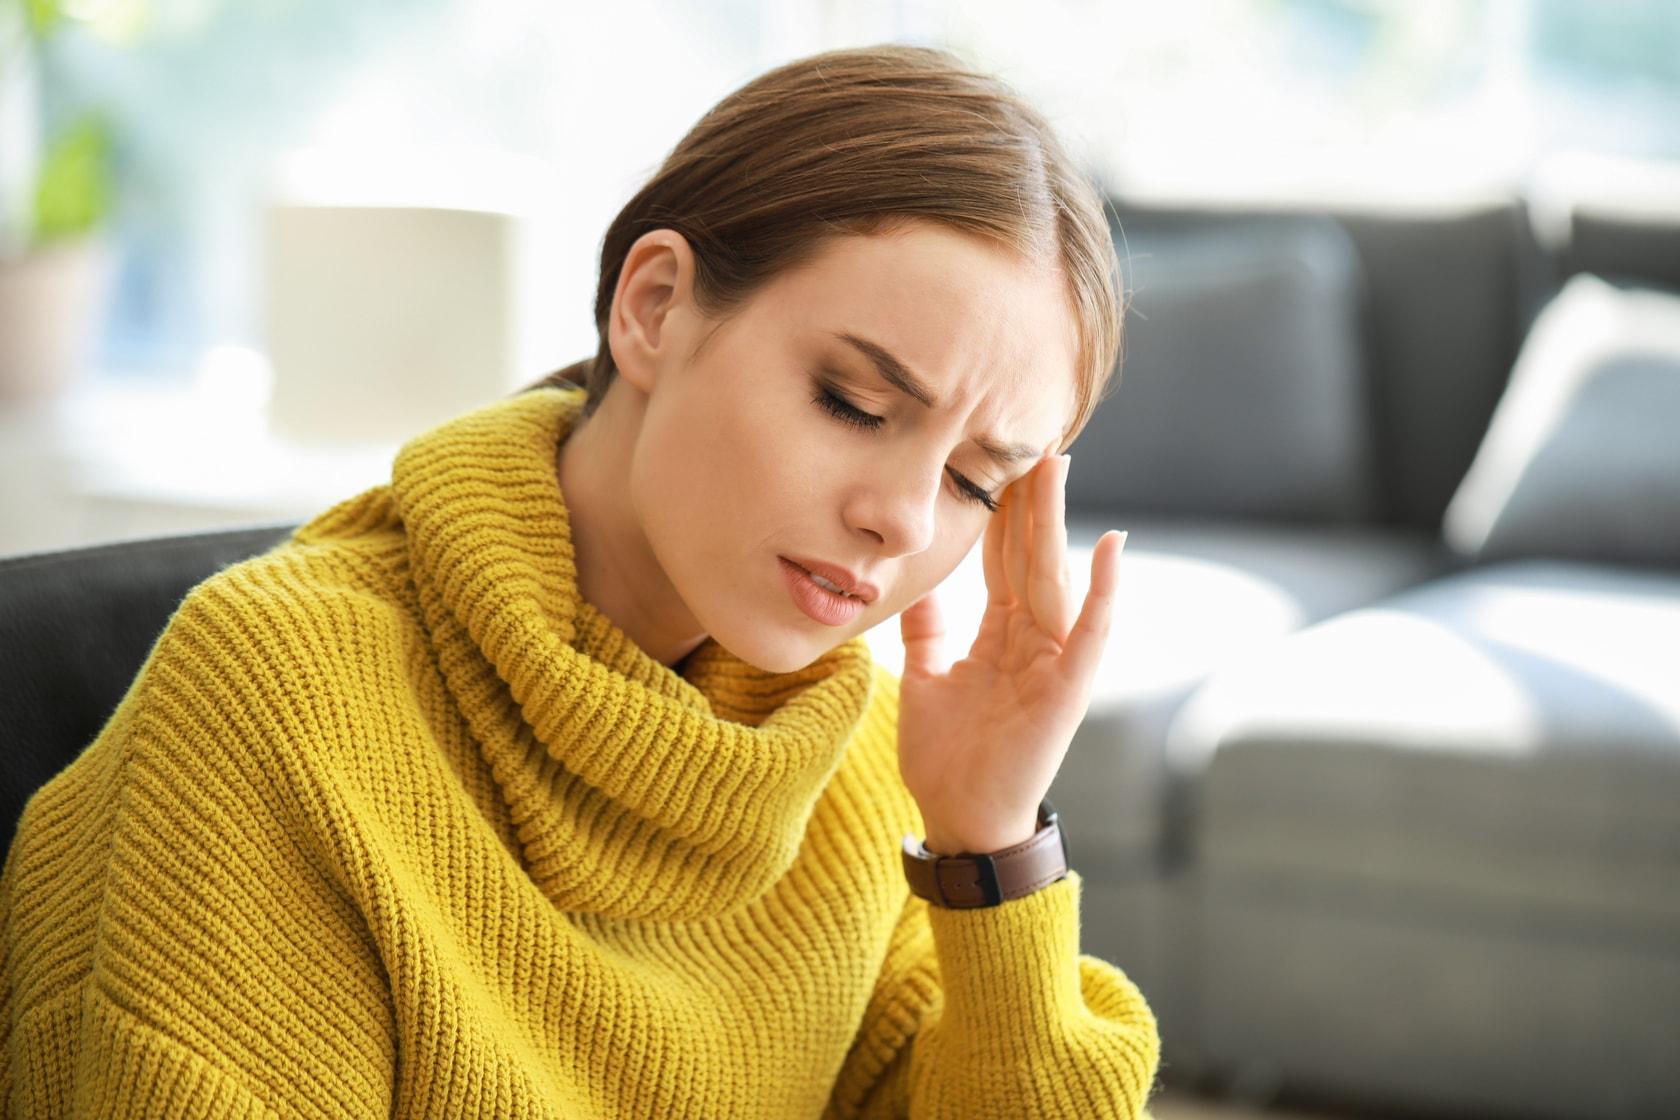 Giant Cell Arteritis - Symptoms